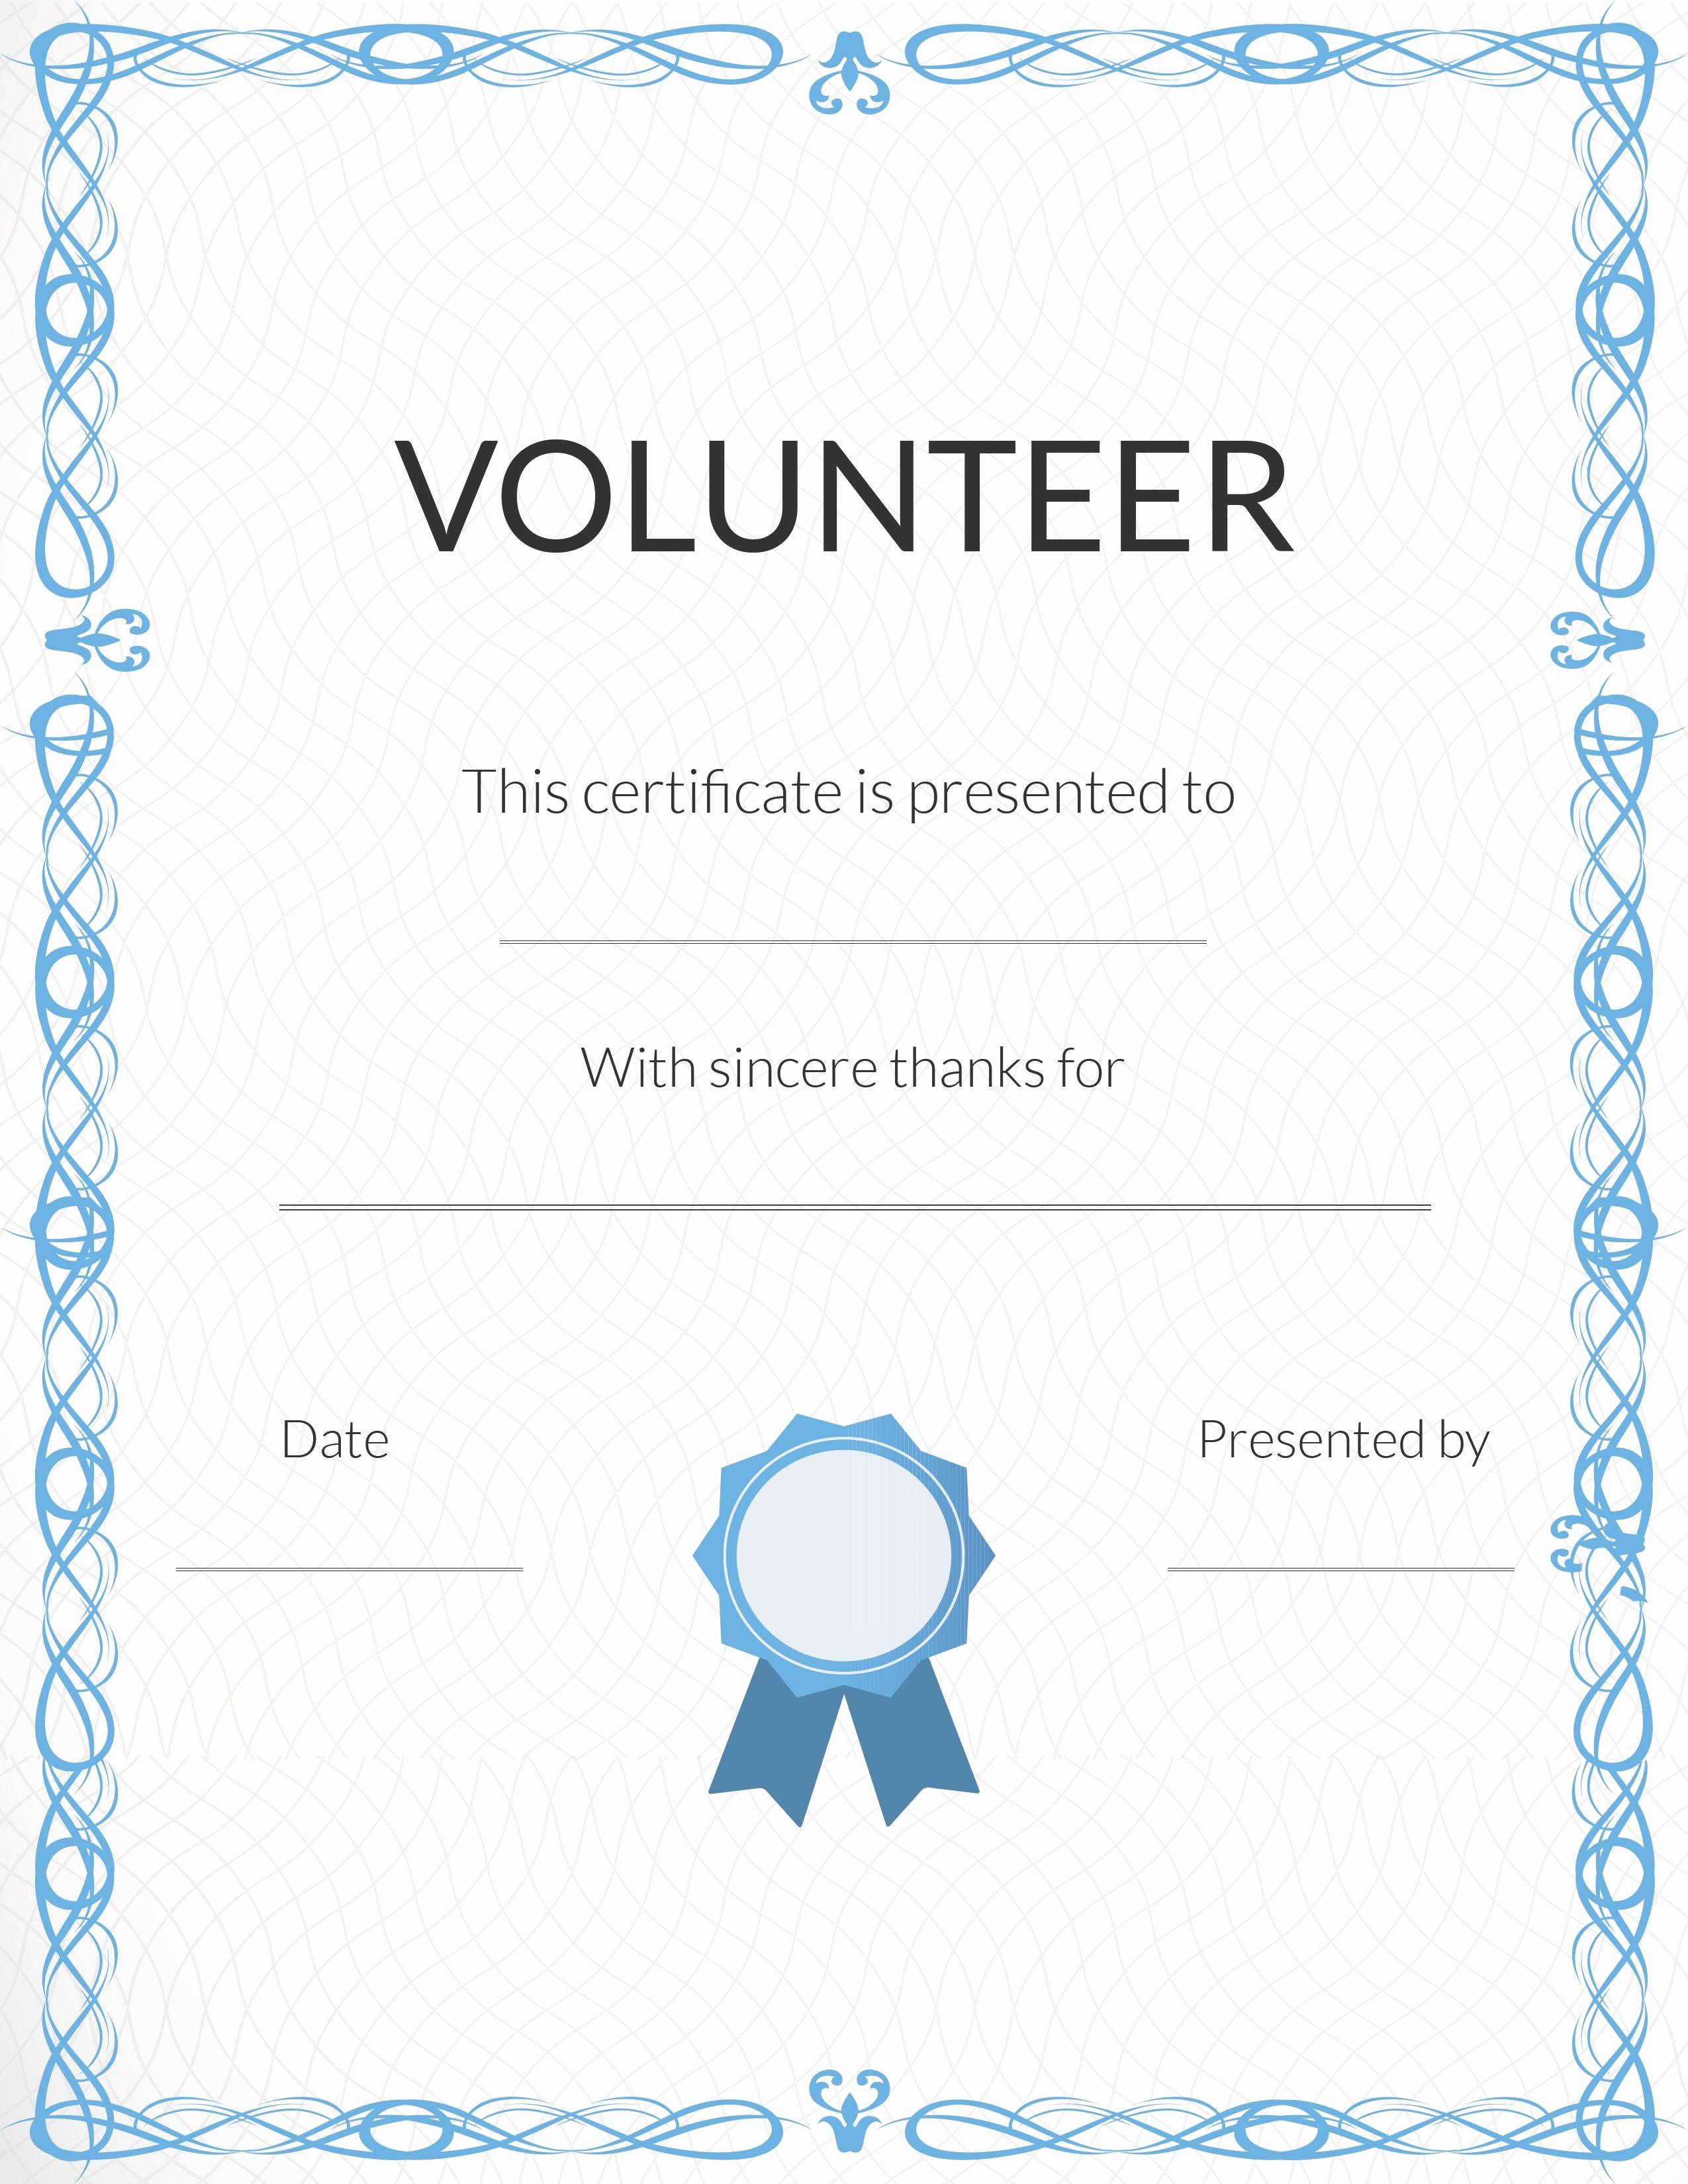 Template for Certificate Of Appreciation Elegant Free Volunteer Appreciation Certificates — Signup